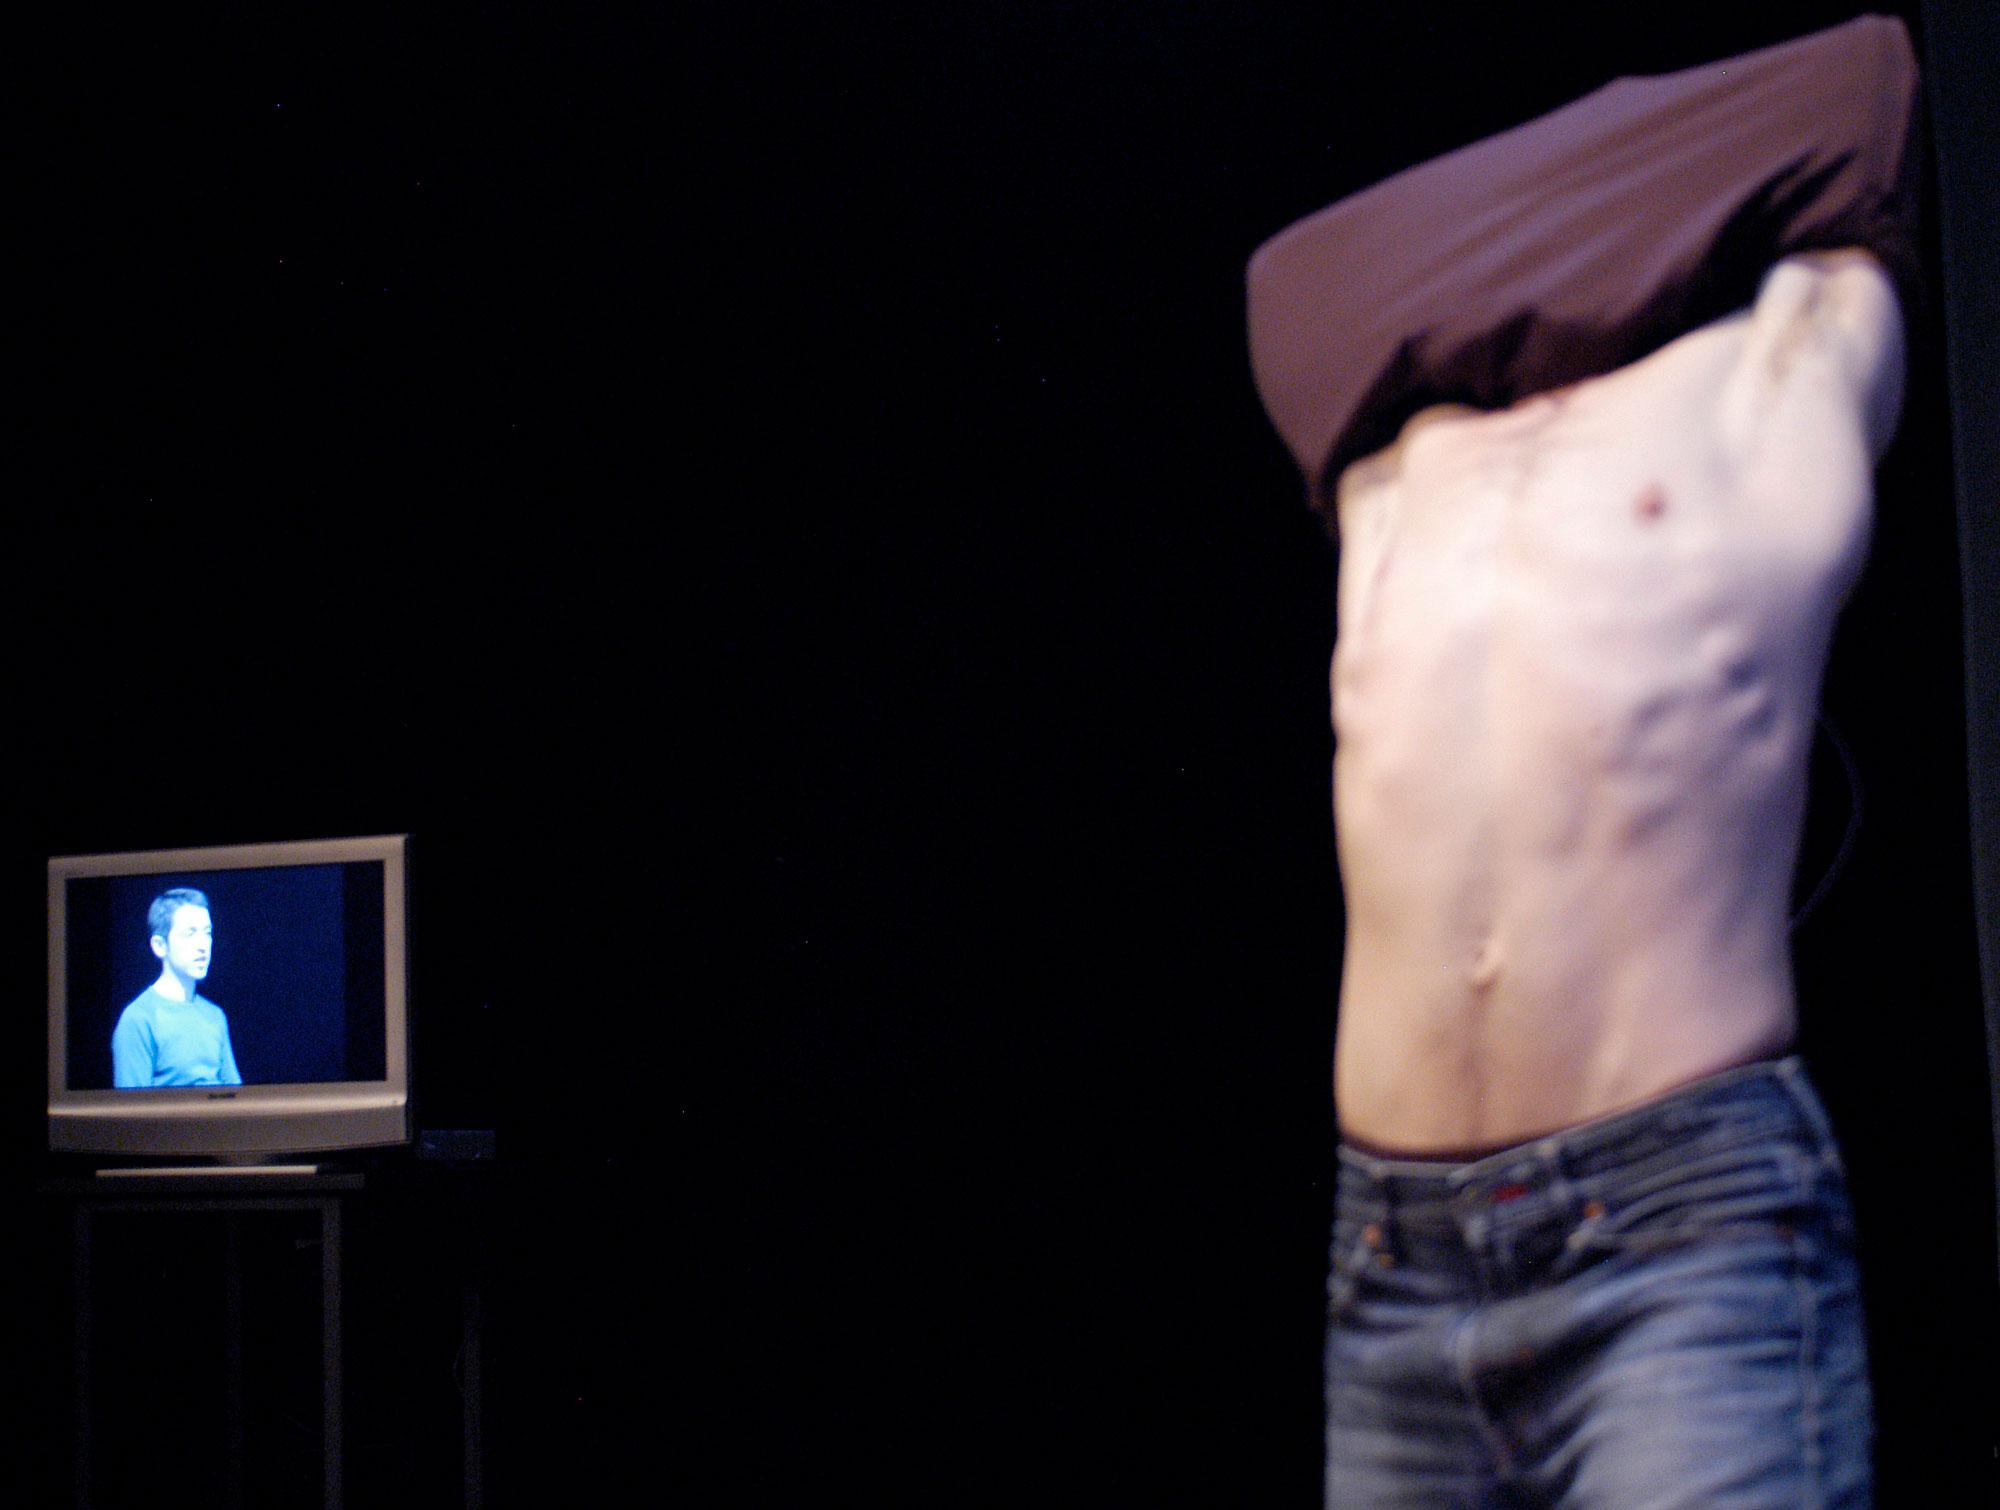 WEB_INFINI25TV-Tshirt-photo-Christian-Lutz.jpg